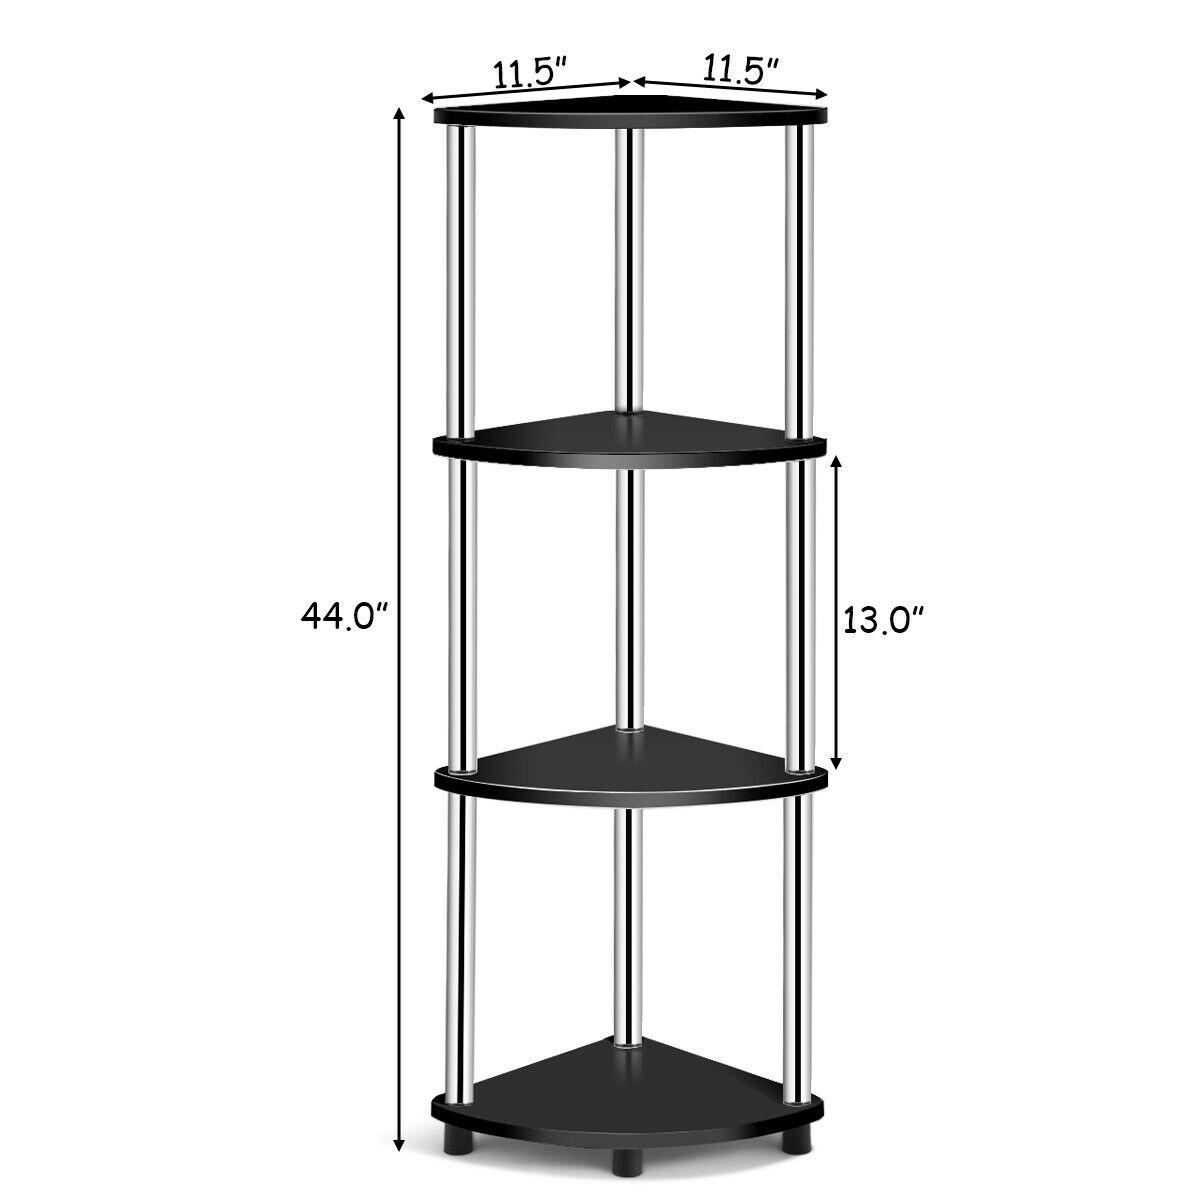 4-Tier Light Duty Living Room Display Stand Corner Shelf